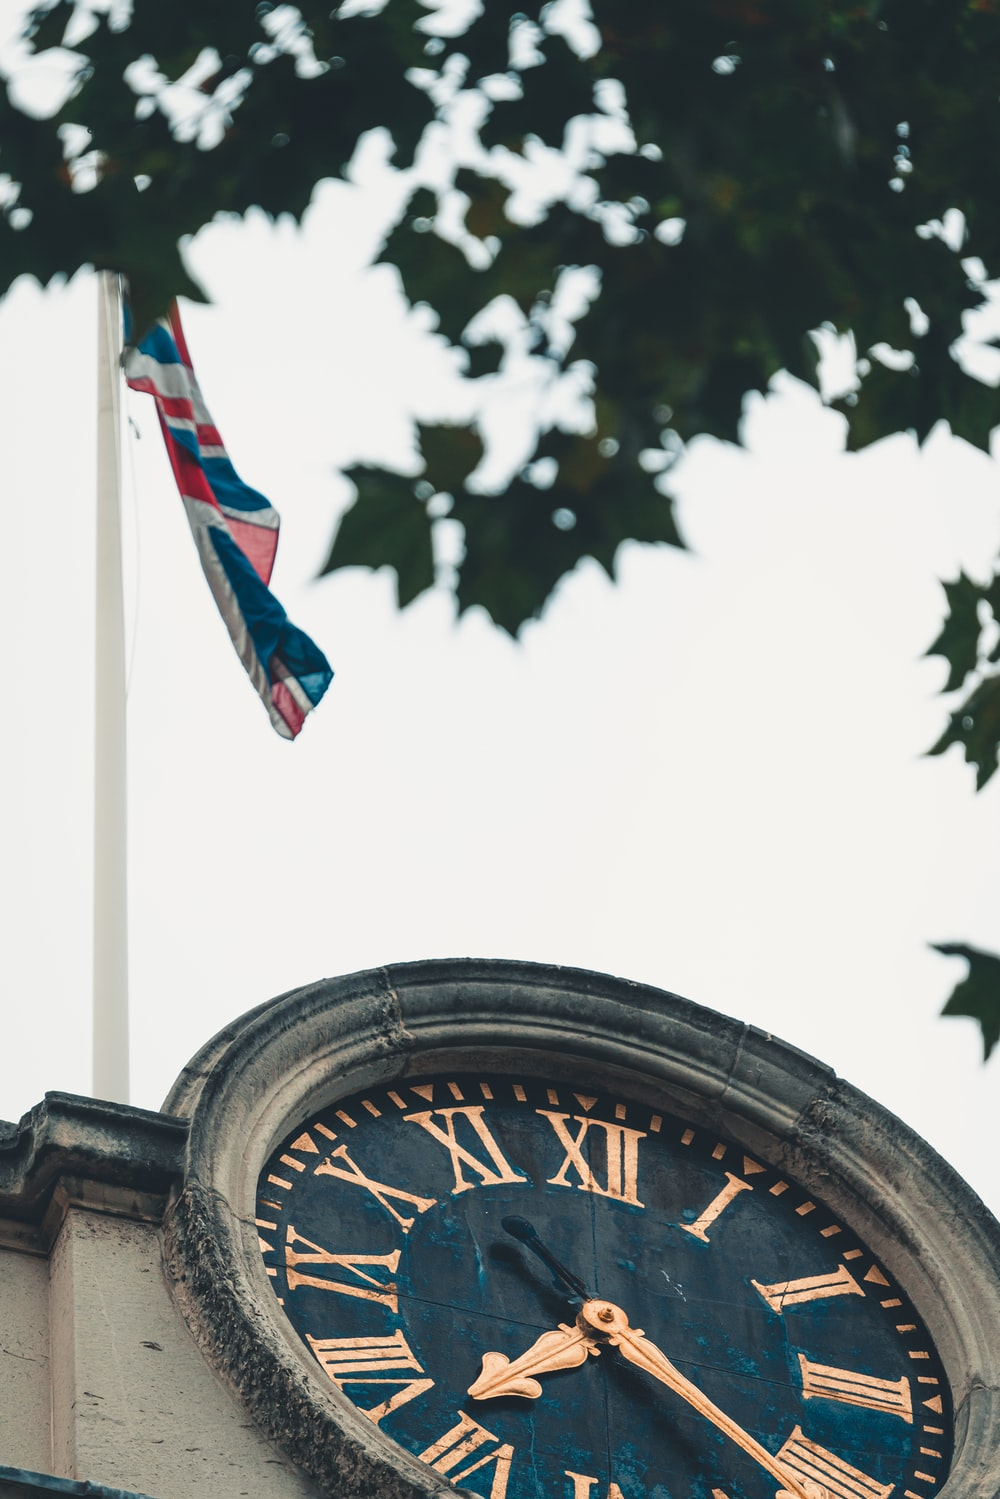 waving flag over clock